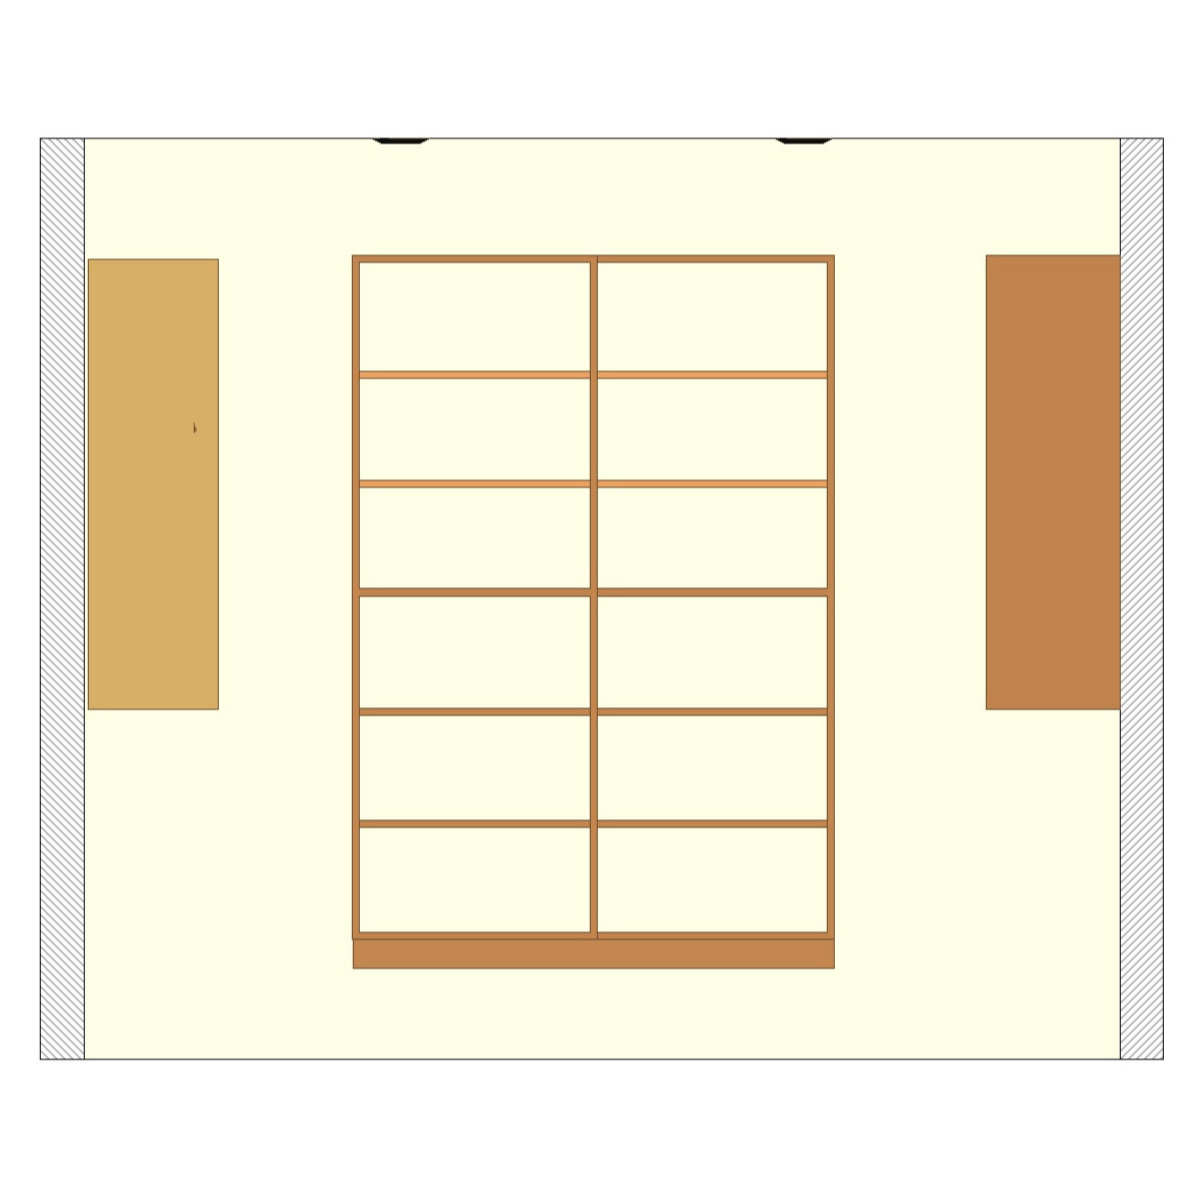 Double Shelving Unit - Basic Walk-In